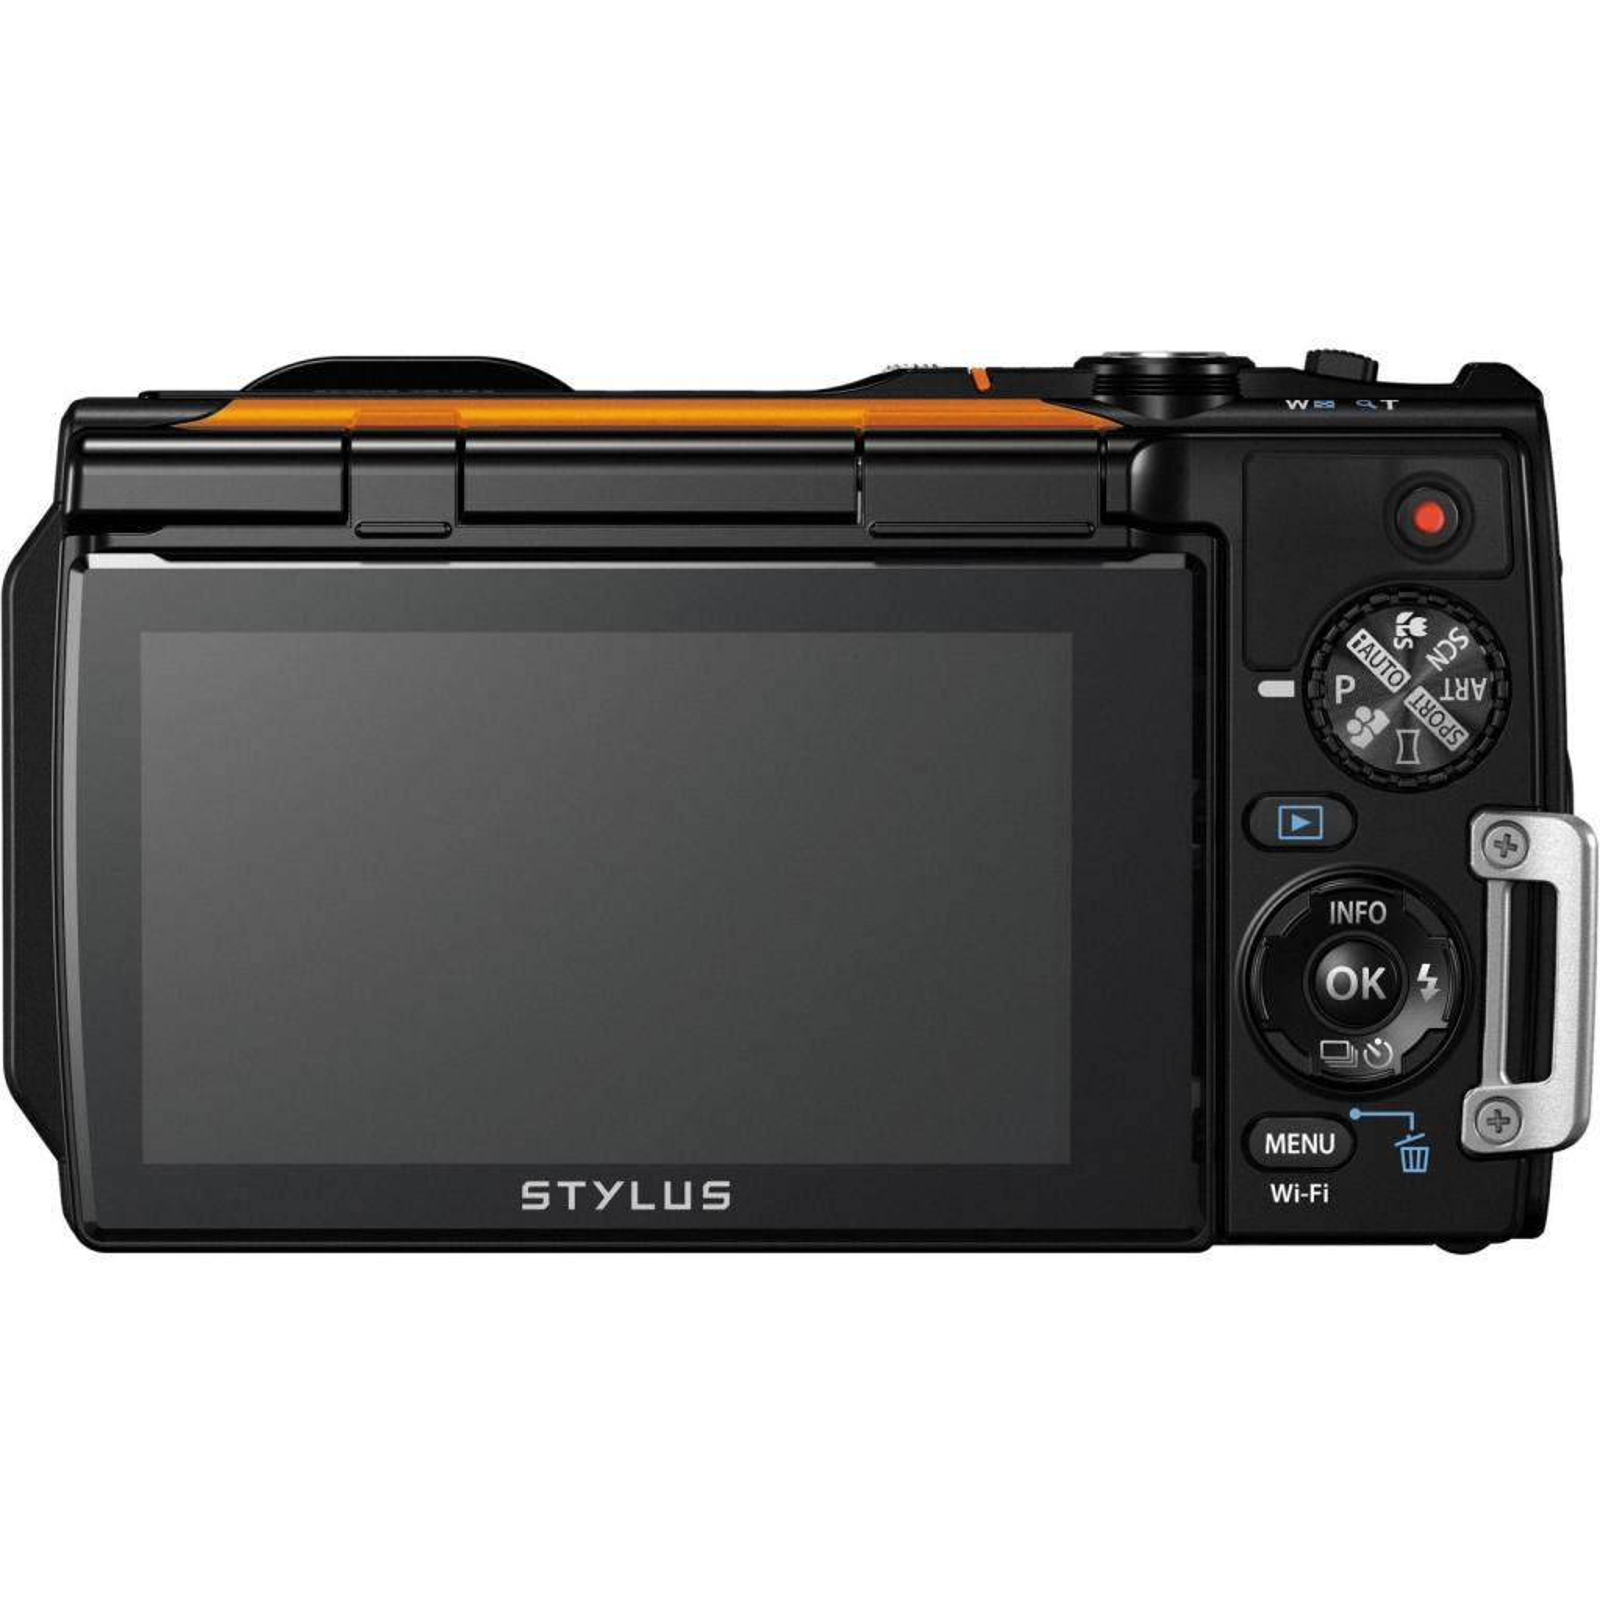 Цифровой фотоаппарат OLYMPUS TG-860 Orange (Waterproof - 15m; iHS; Wi-Fi) (V104170OE000) изображение 4